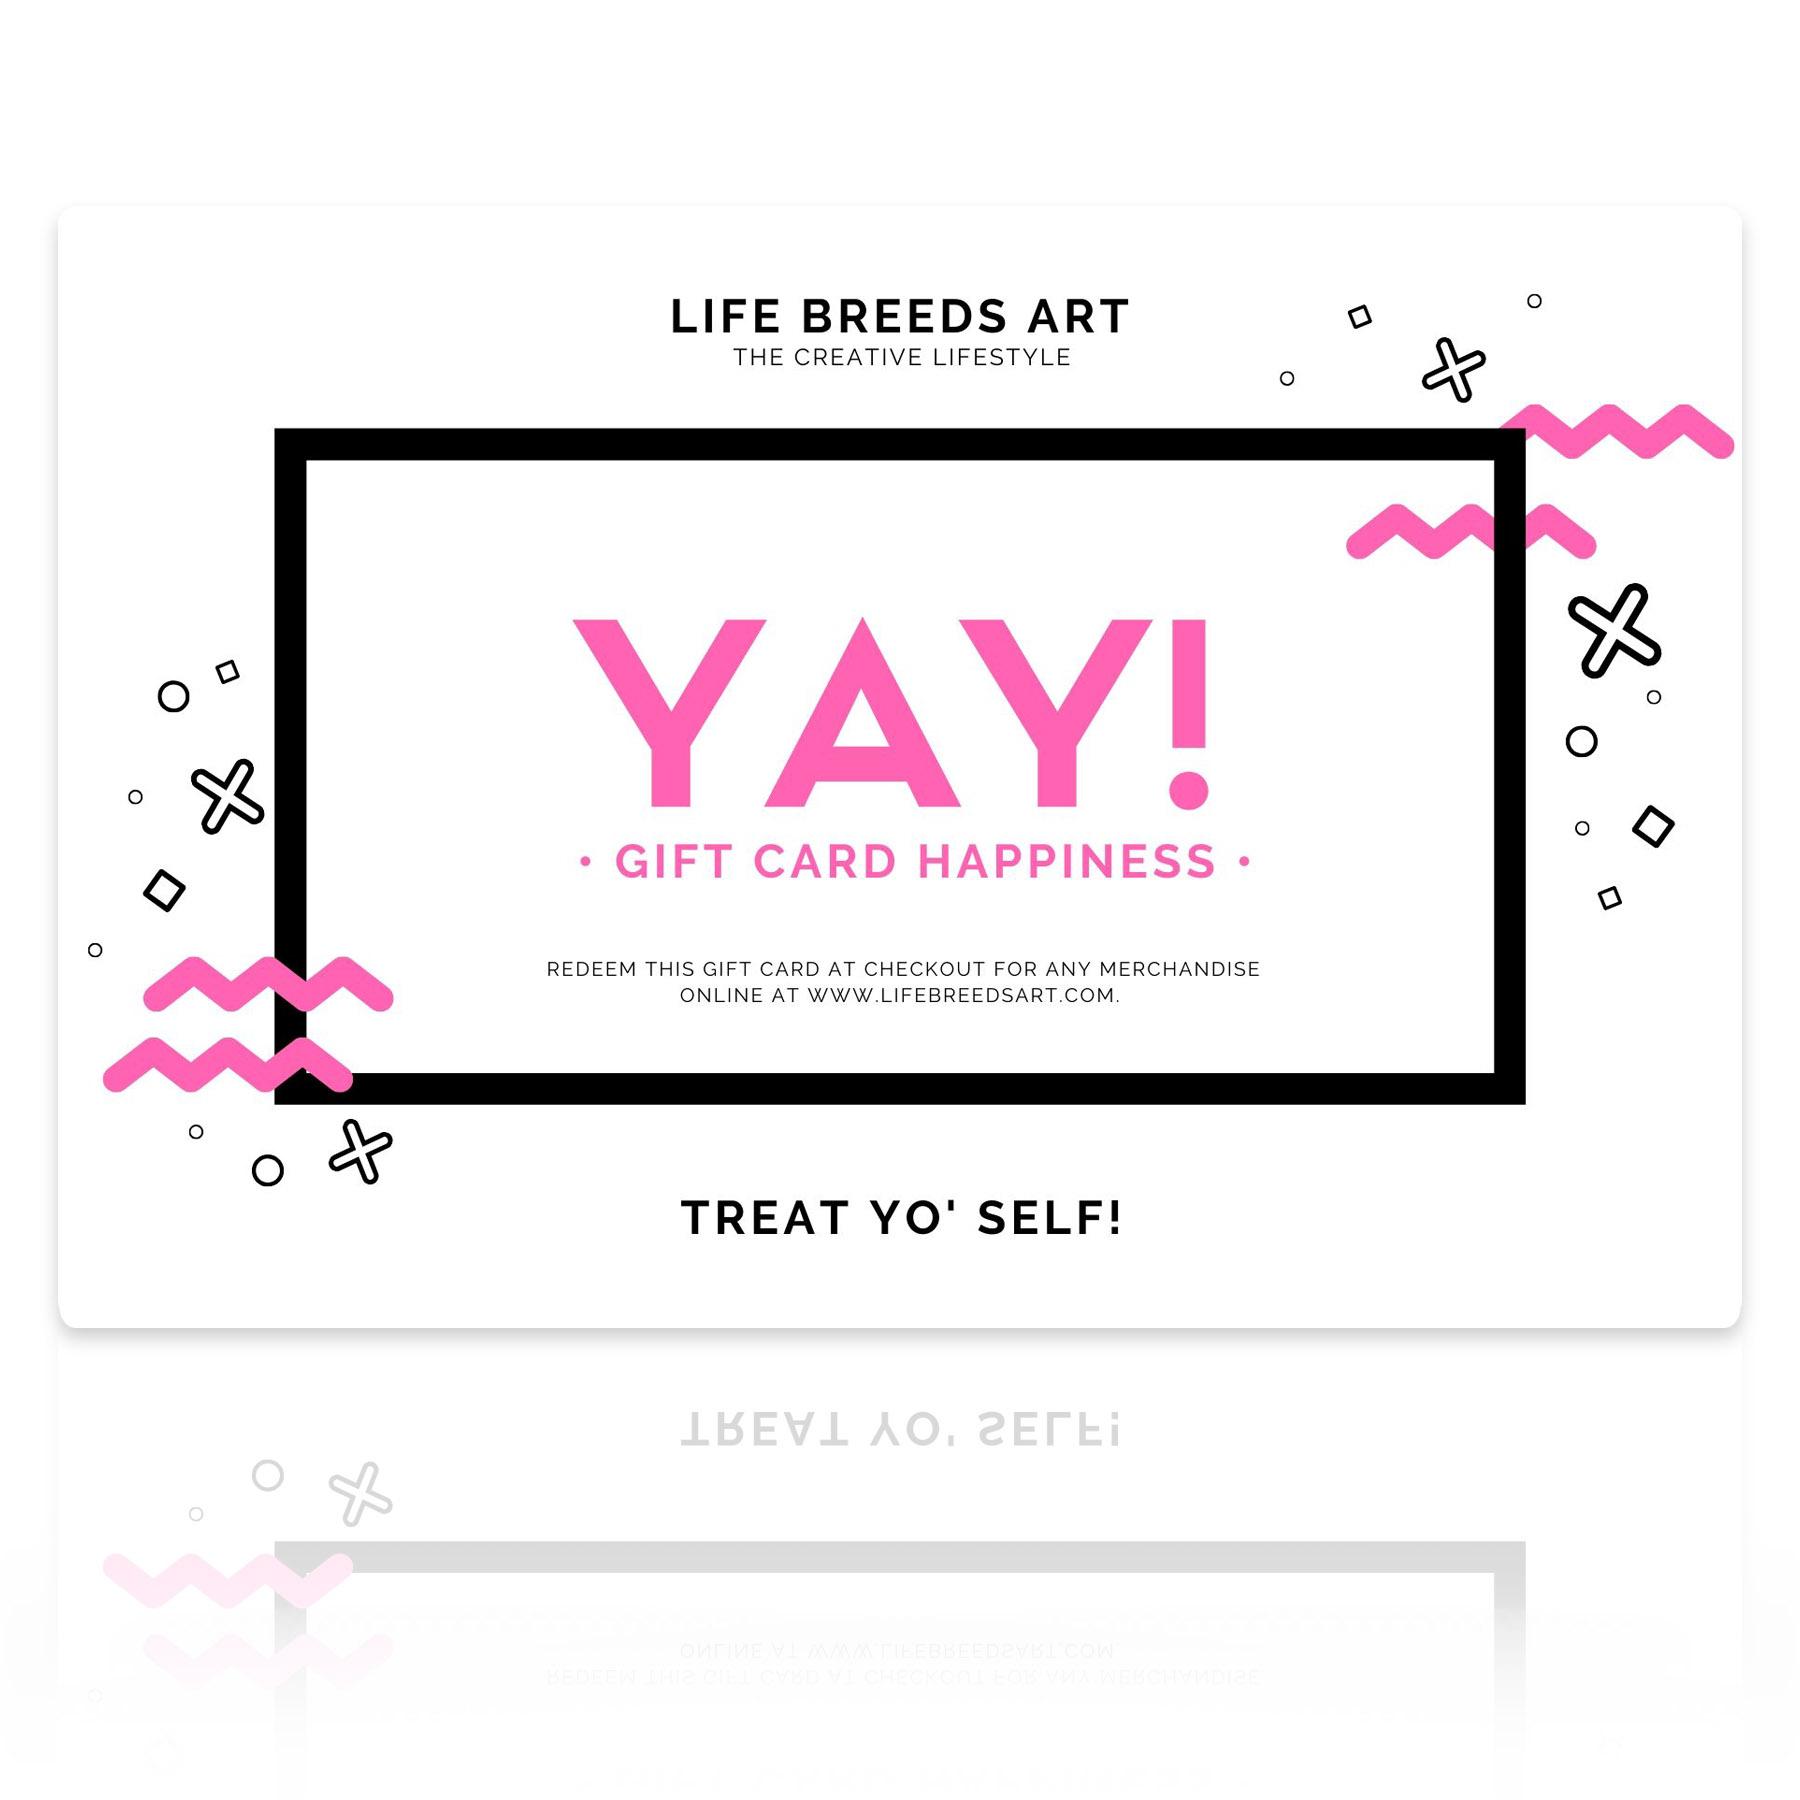 Life Breeds Art Gift Card